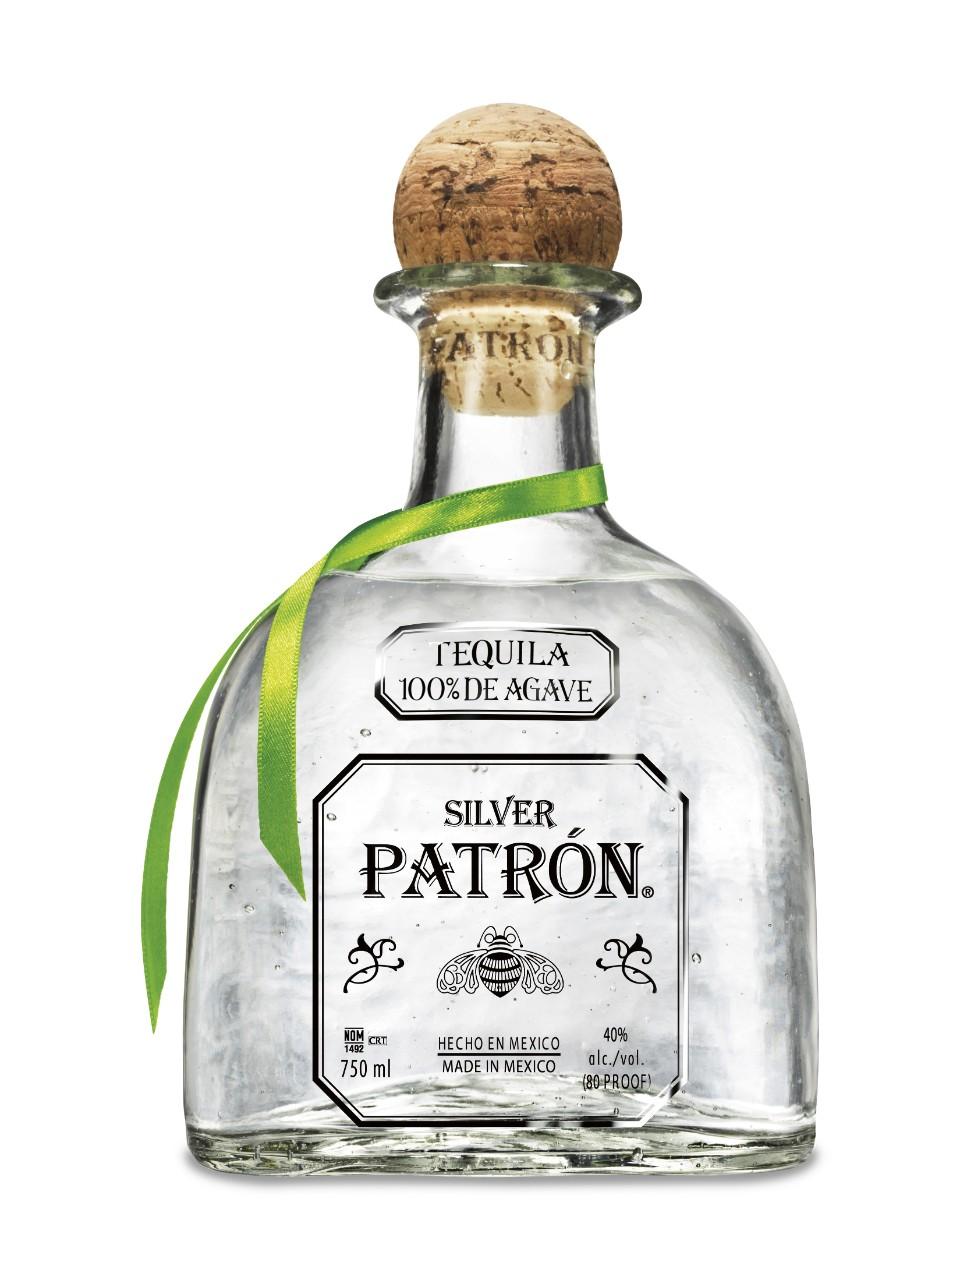 Patron Silver Tequila Lcbo